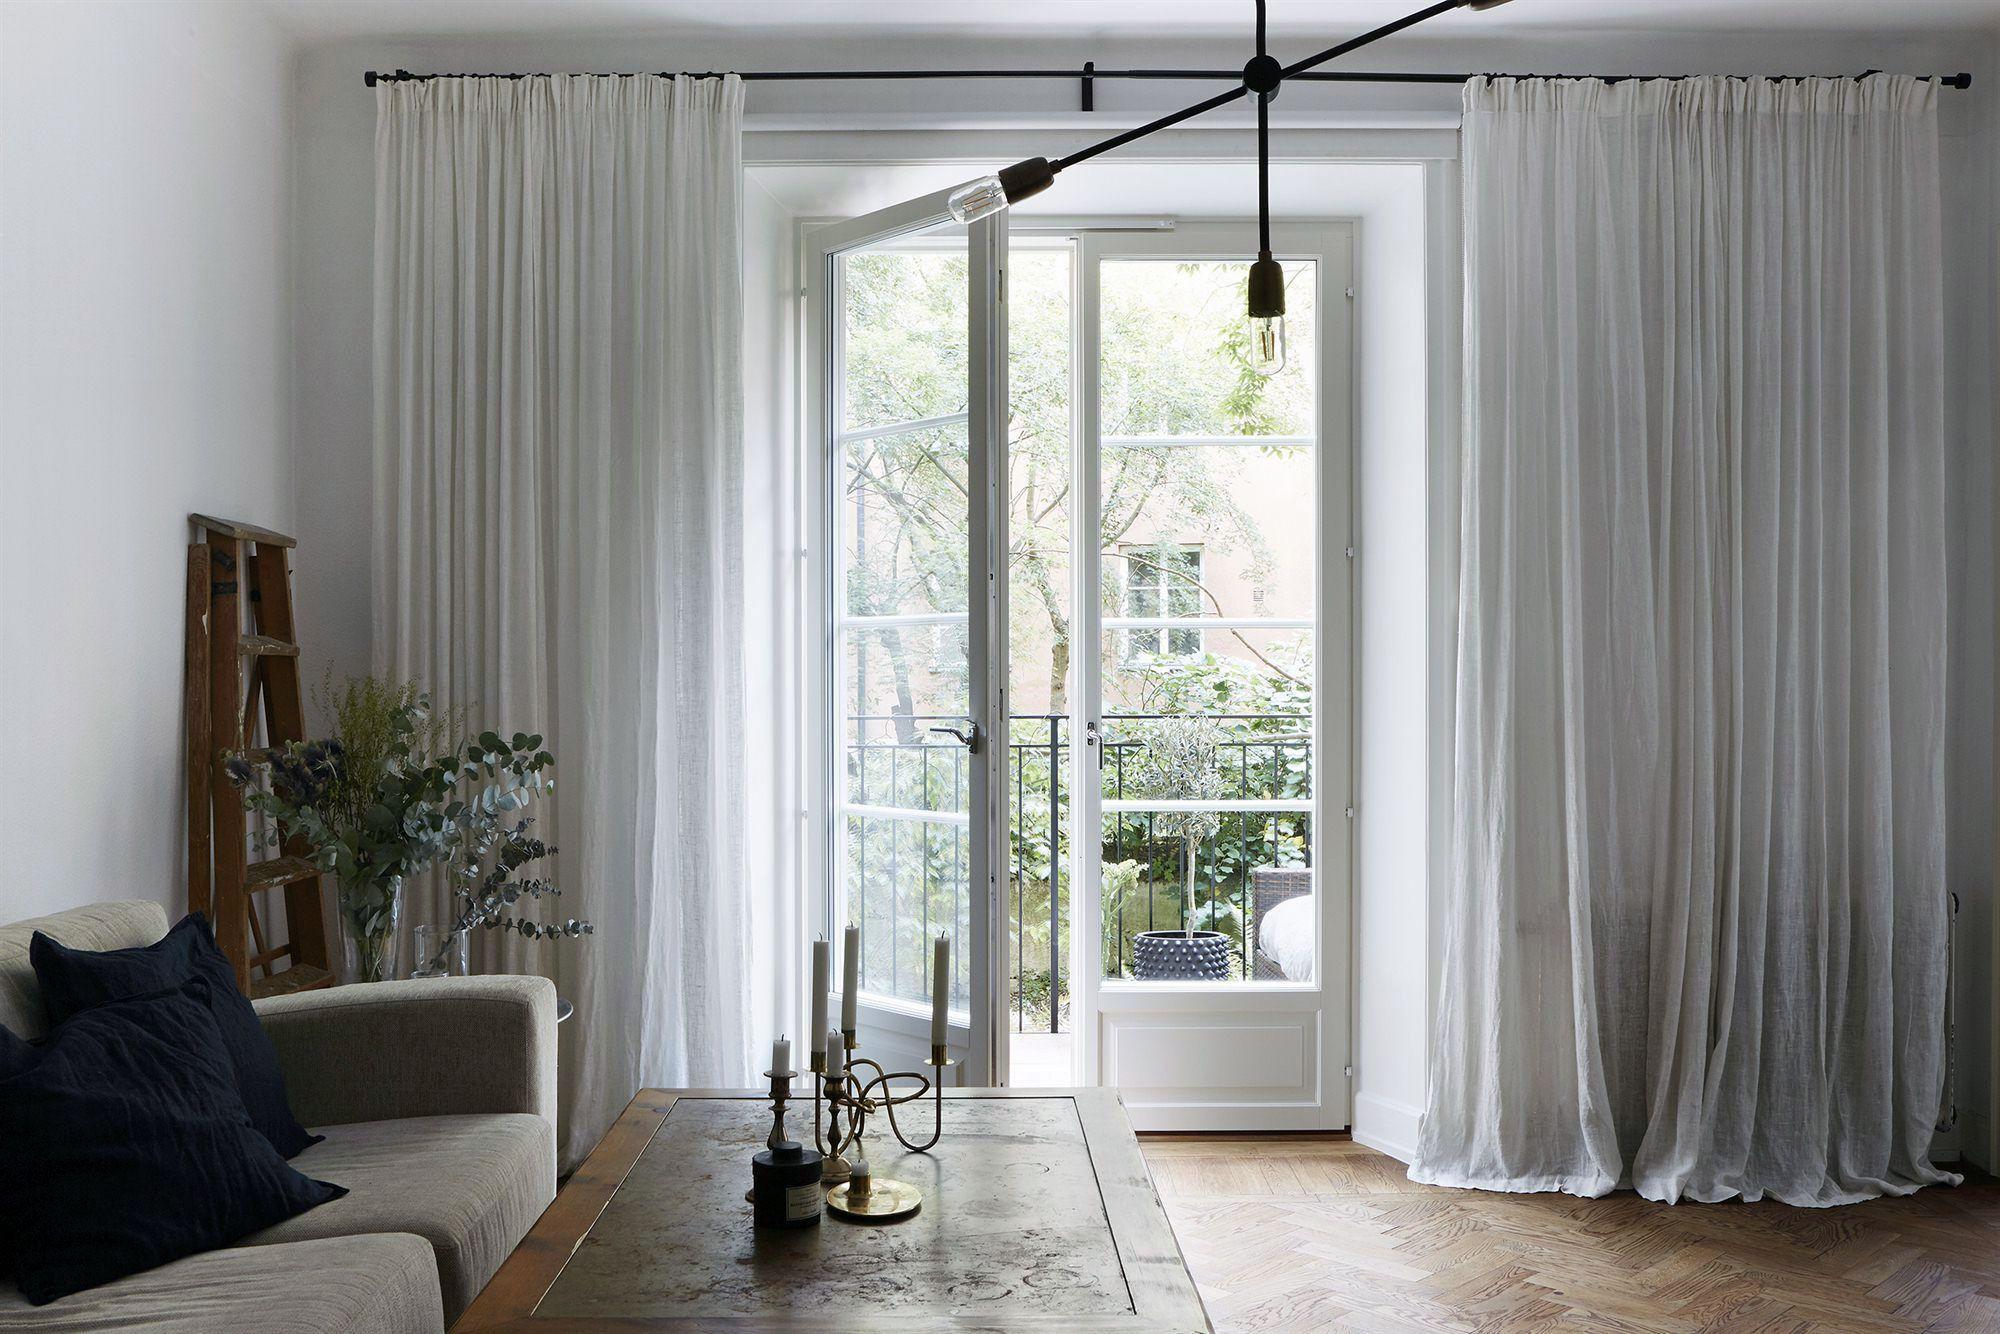 20 Adorable Scandinavian Kitchen Curtains Ideas In 2020 Living Room Scandinavian Scandinavian Curtains Scandinavian Doors